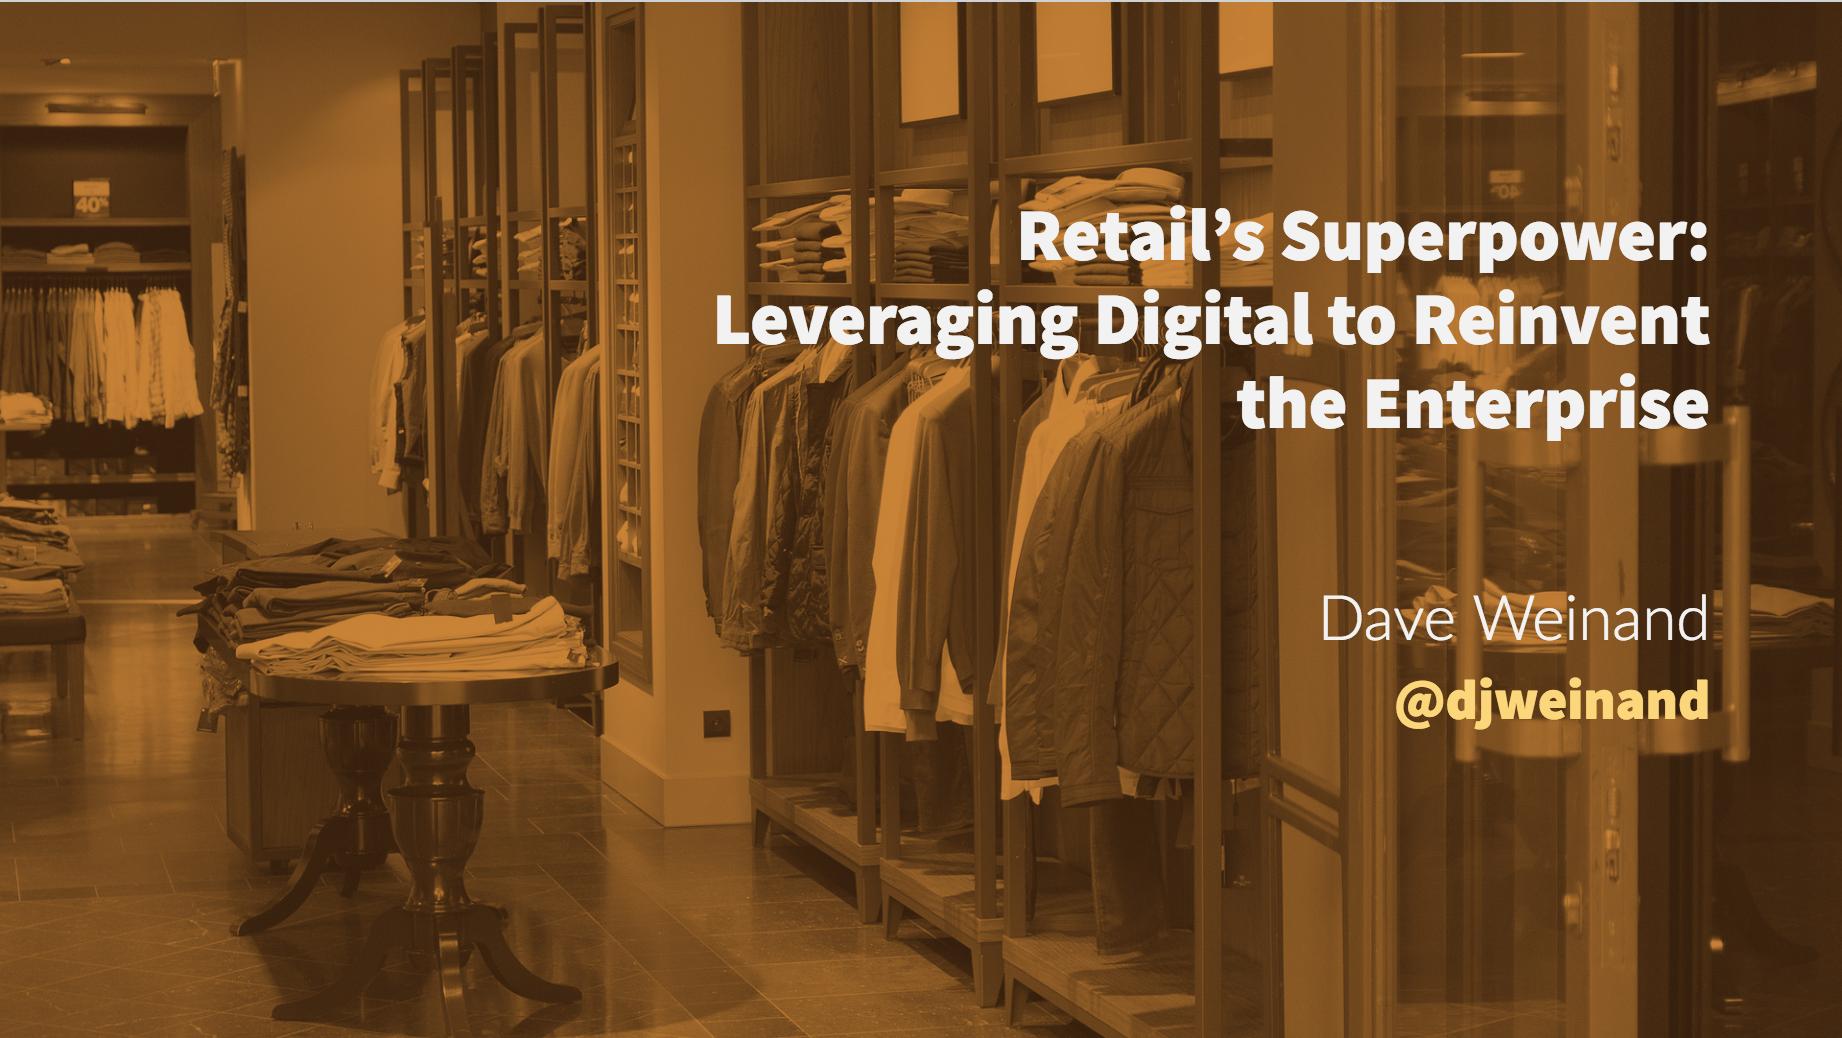 Retail's Superpower: Leveraging Digital to Reinvent the Enterprise